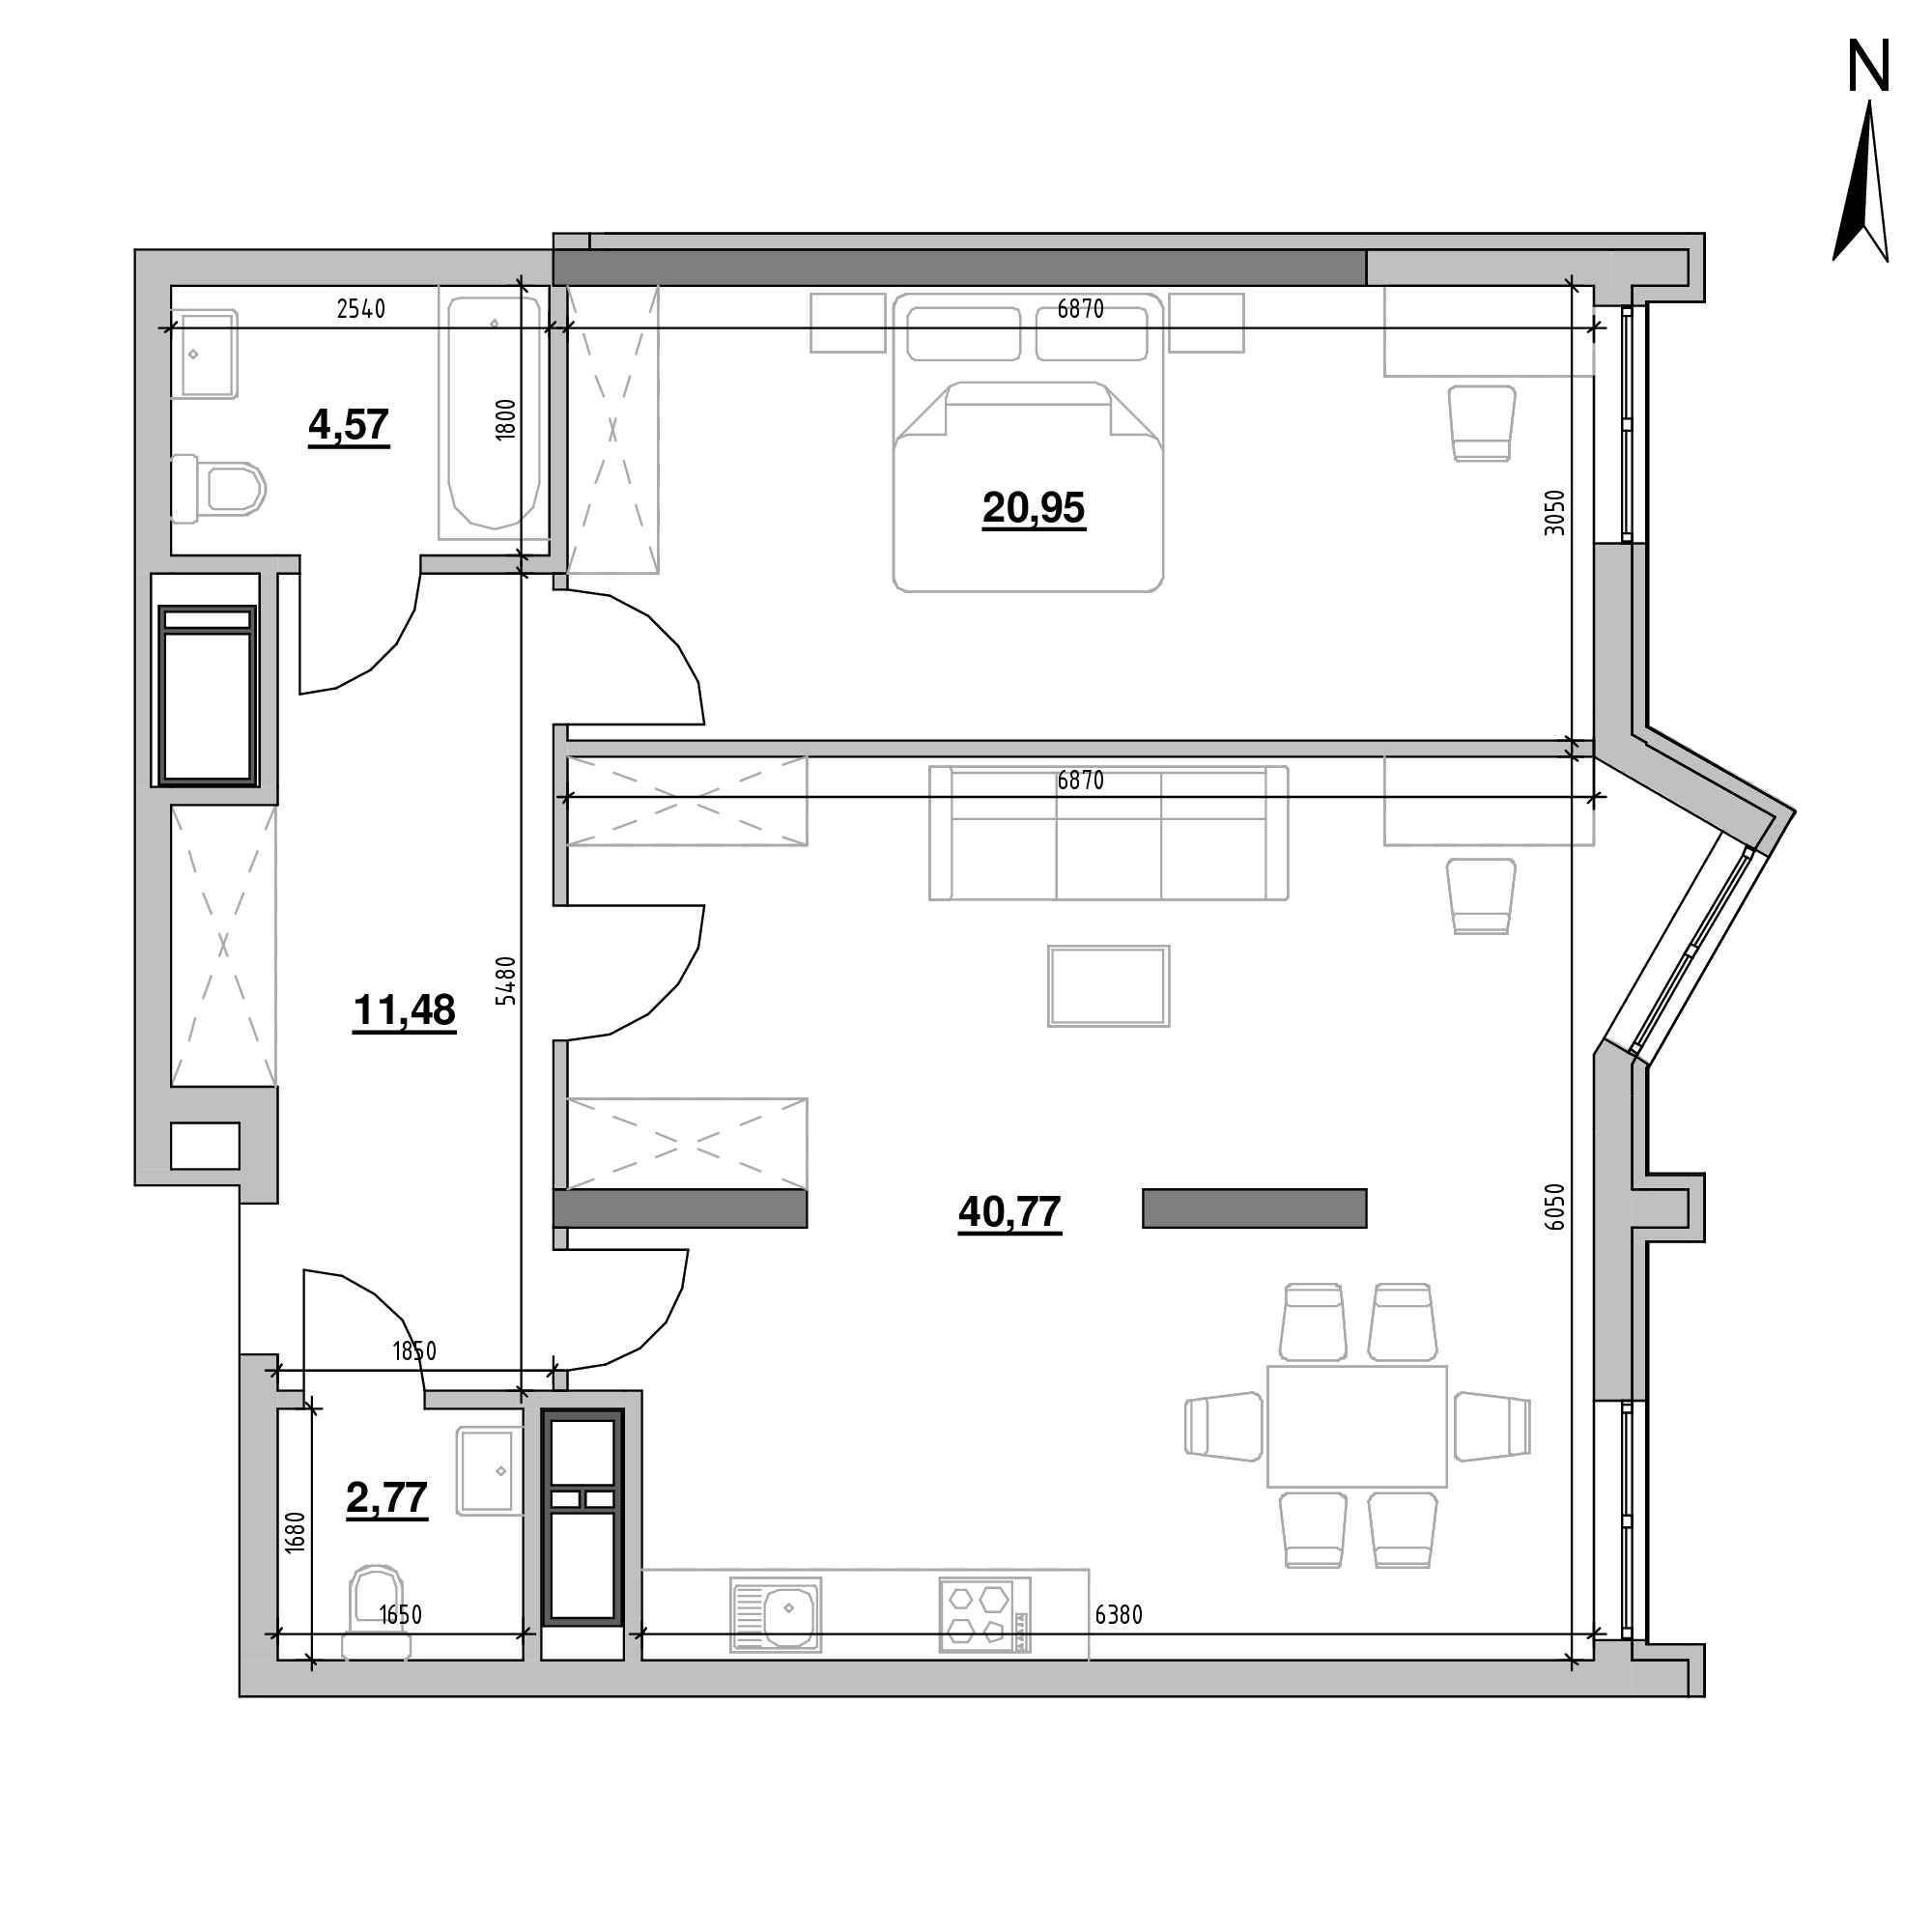 ЖК Nordica Residence: планування 1-кімнатної квартири, №8, 80.54 м<sup>2</sup>